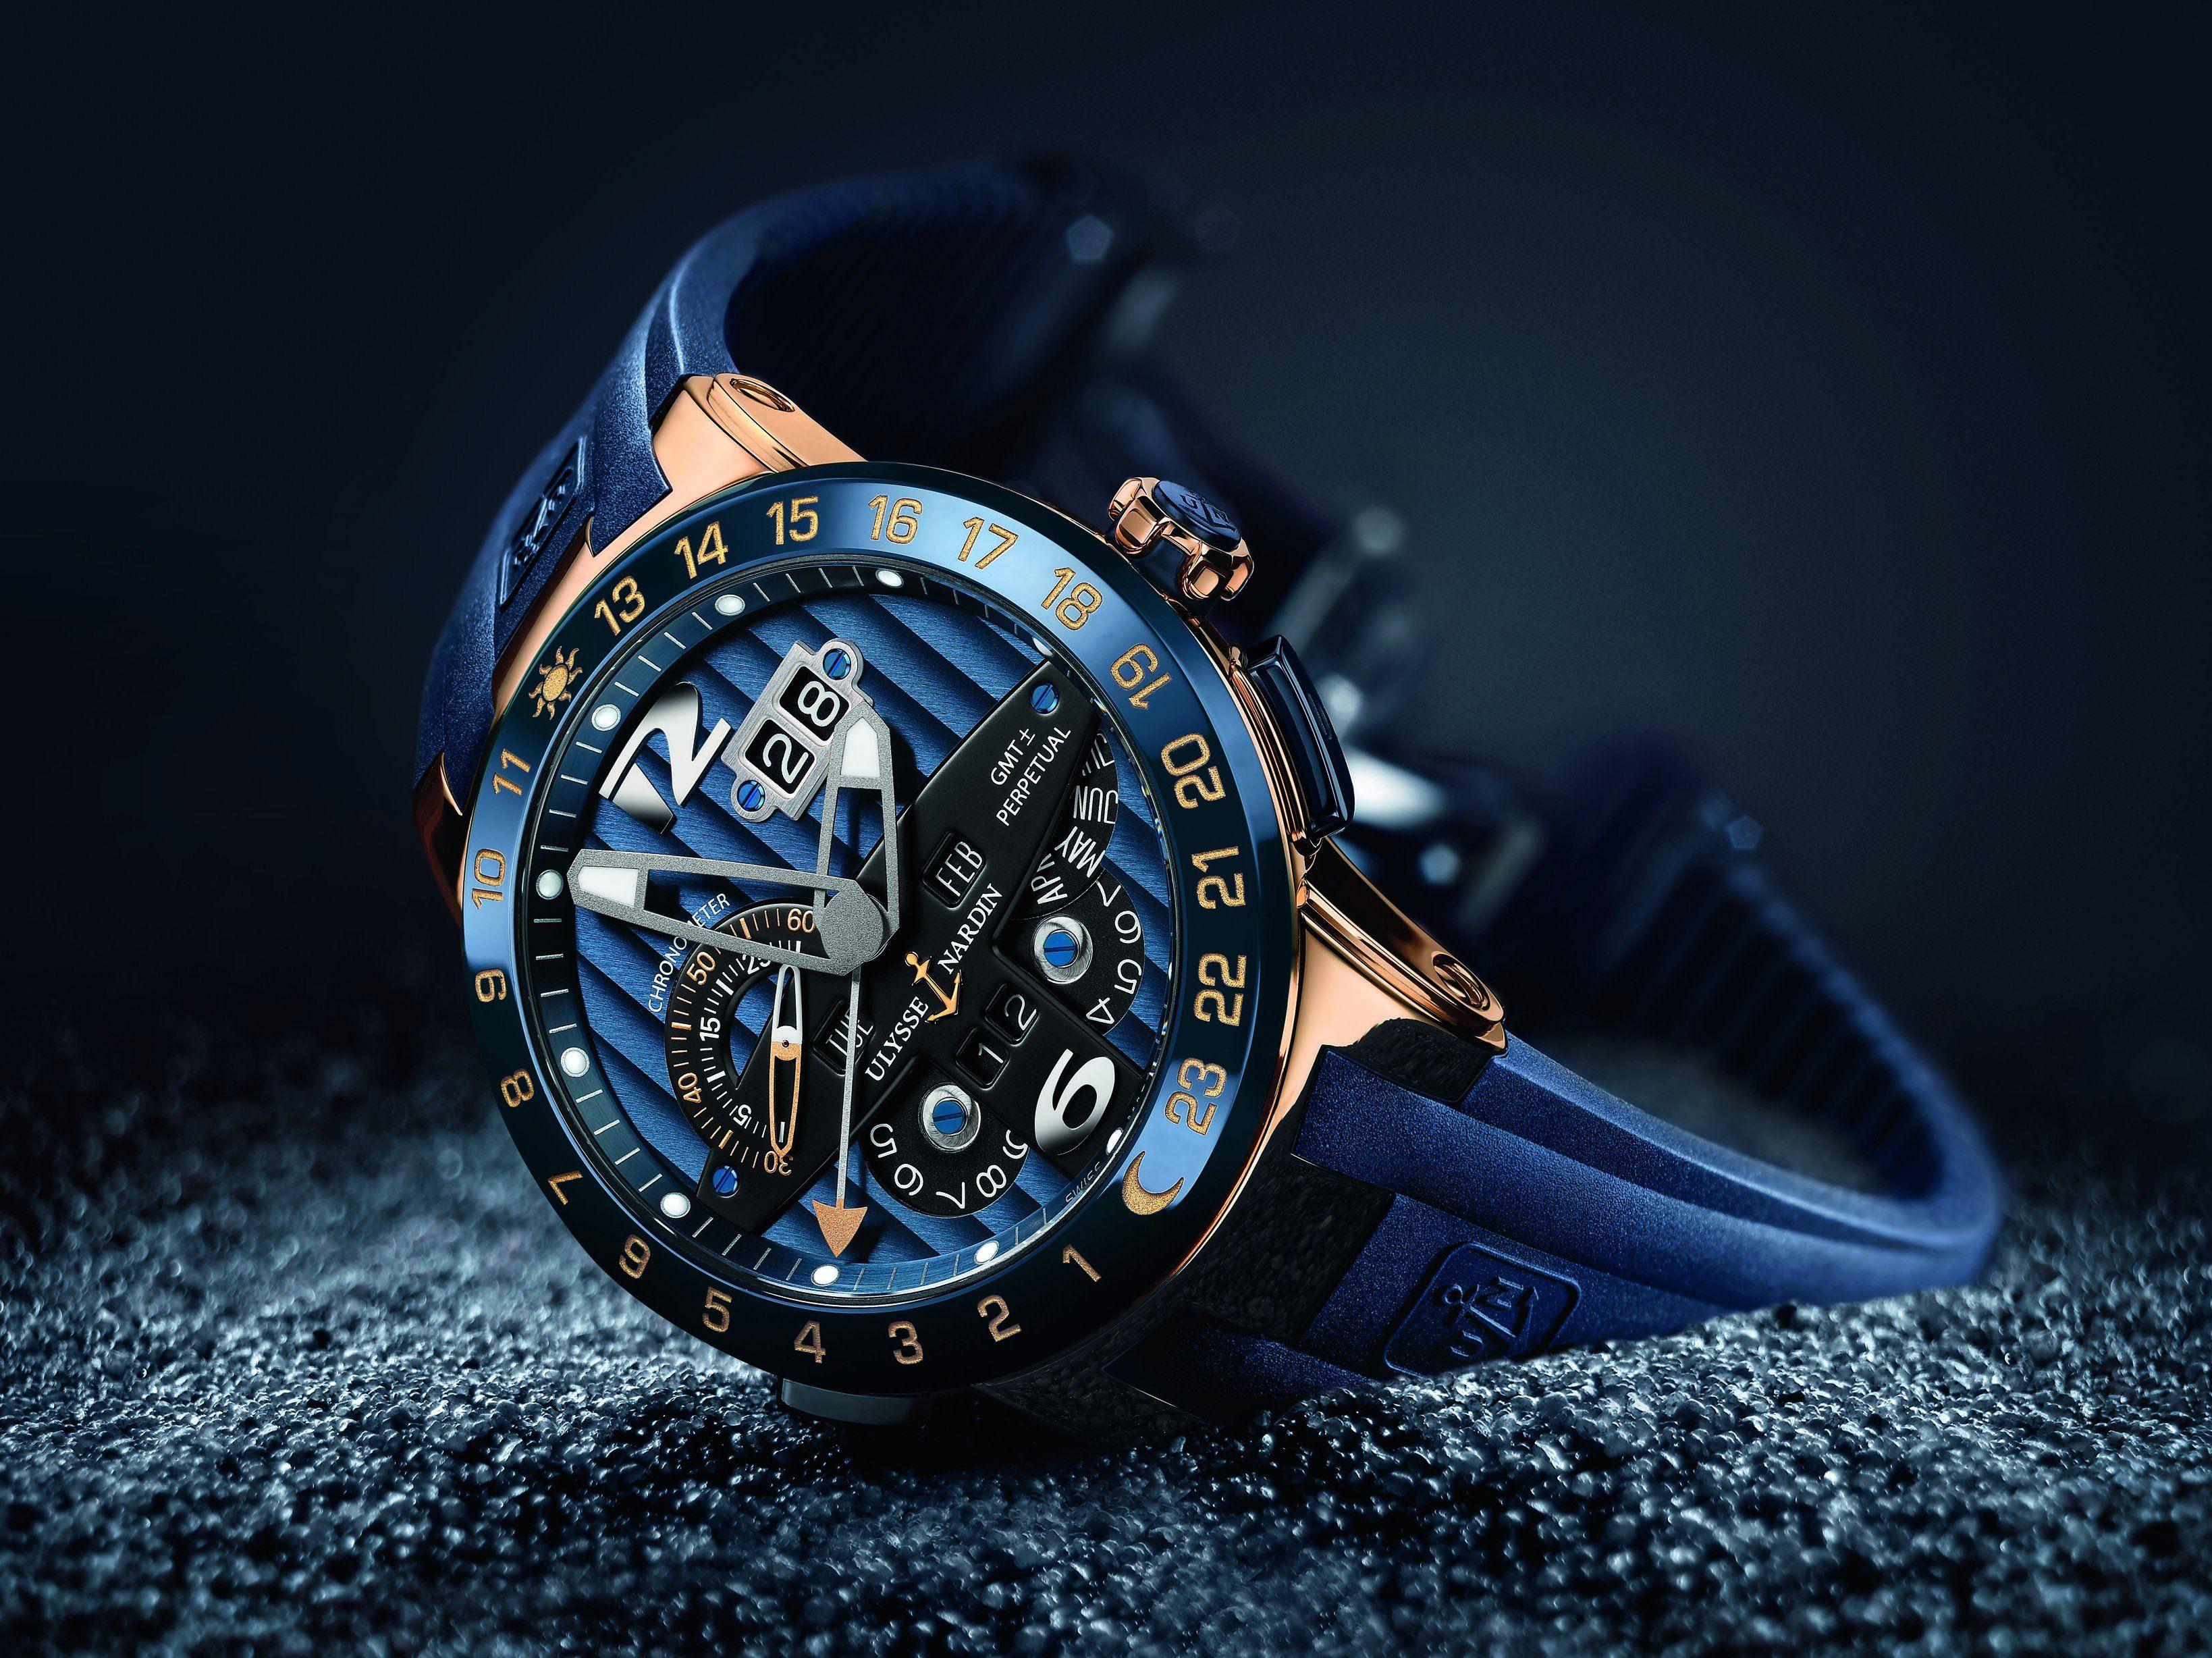 Luxury Watch Wallpapers   Top Luxury Watch Backgrounds 3277x2456